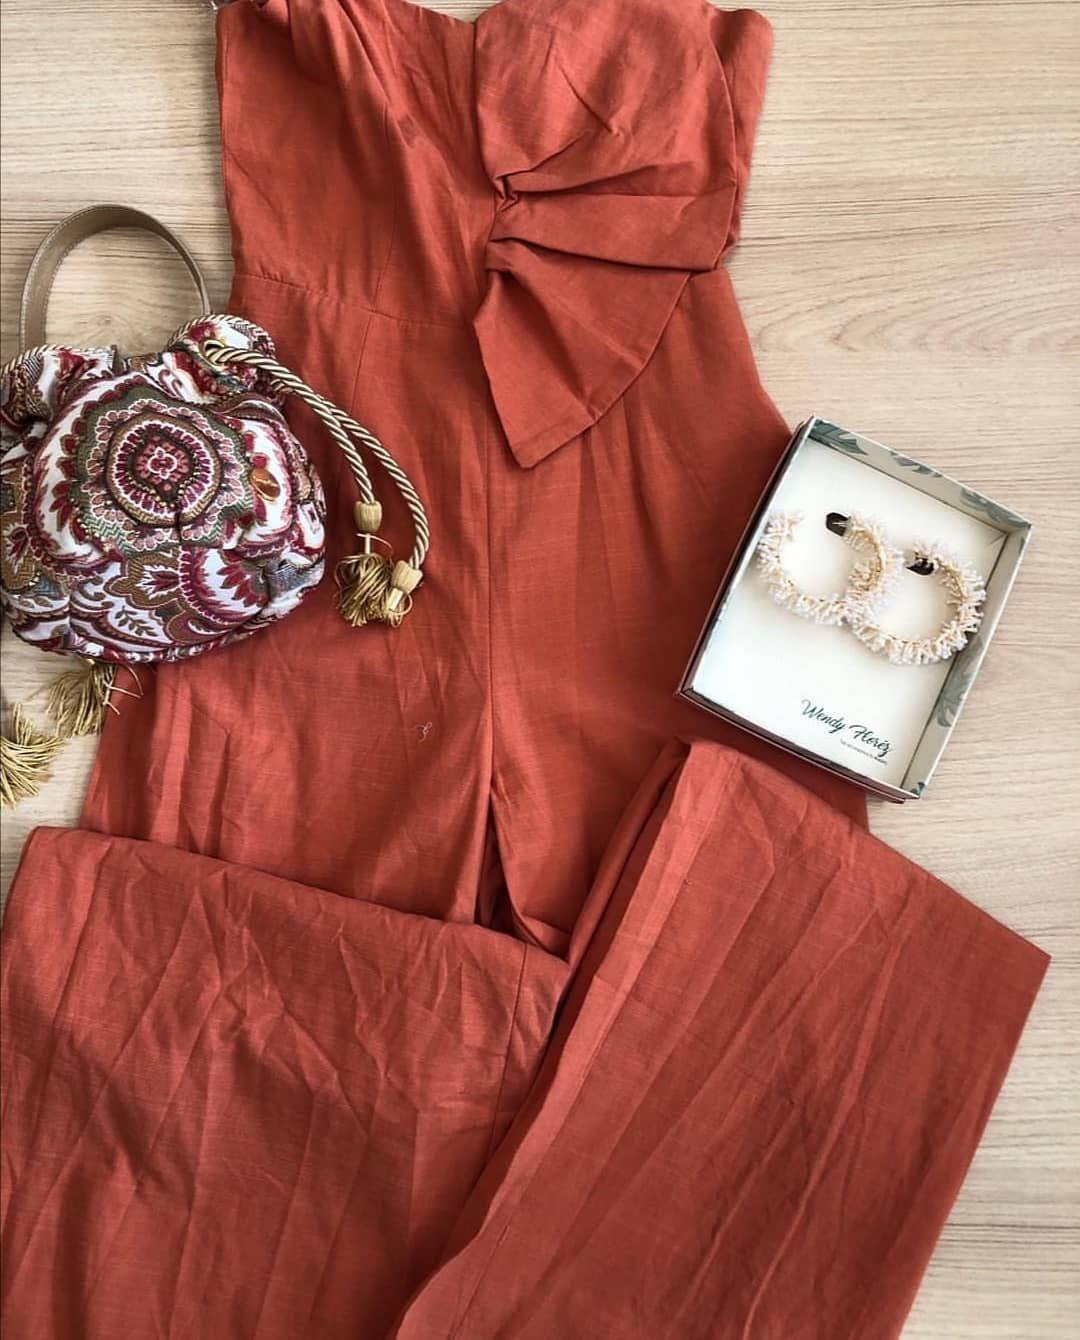 PROMO DE AMOR Y AMISTAD ❤️🎀 ENTERIZO DISPONIBLE  TALLA M-L  ENTREGA INMEDIATA 📲3003626319 Envios a todo el pais 📦 Se aceptan todas las 💳💳💳 . . . . . . #outfit #style #streetstyle #fashionmagazine #flores #estampados #boutique #monteria #shopaholic #shopping #set #newinstore #look #trend #trendy #accesorios #paloderosa #faldas #dress #vestidos #talegos #short #handmade #earrings #shoes #plataformas #sandalias #MAXIDRESS #bags #bolsos